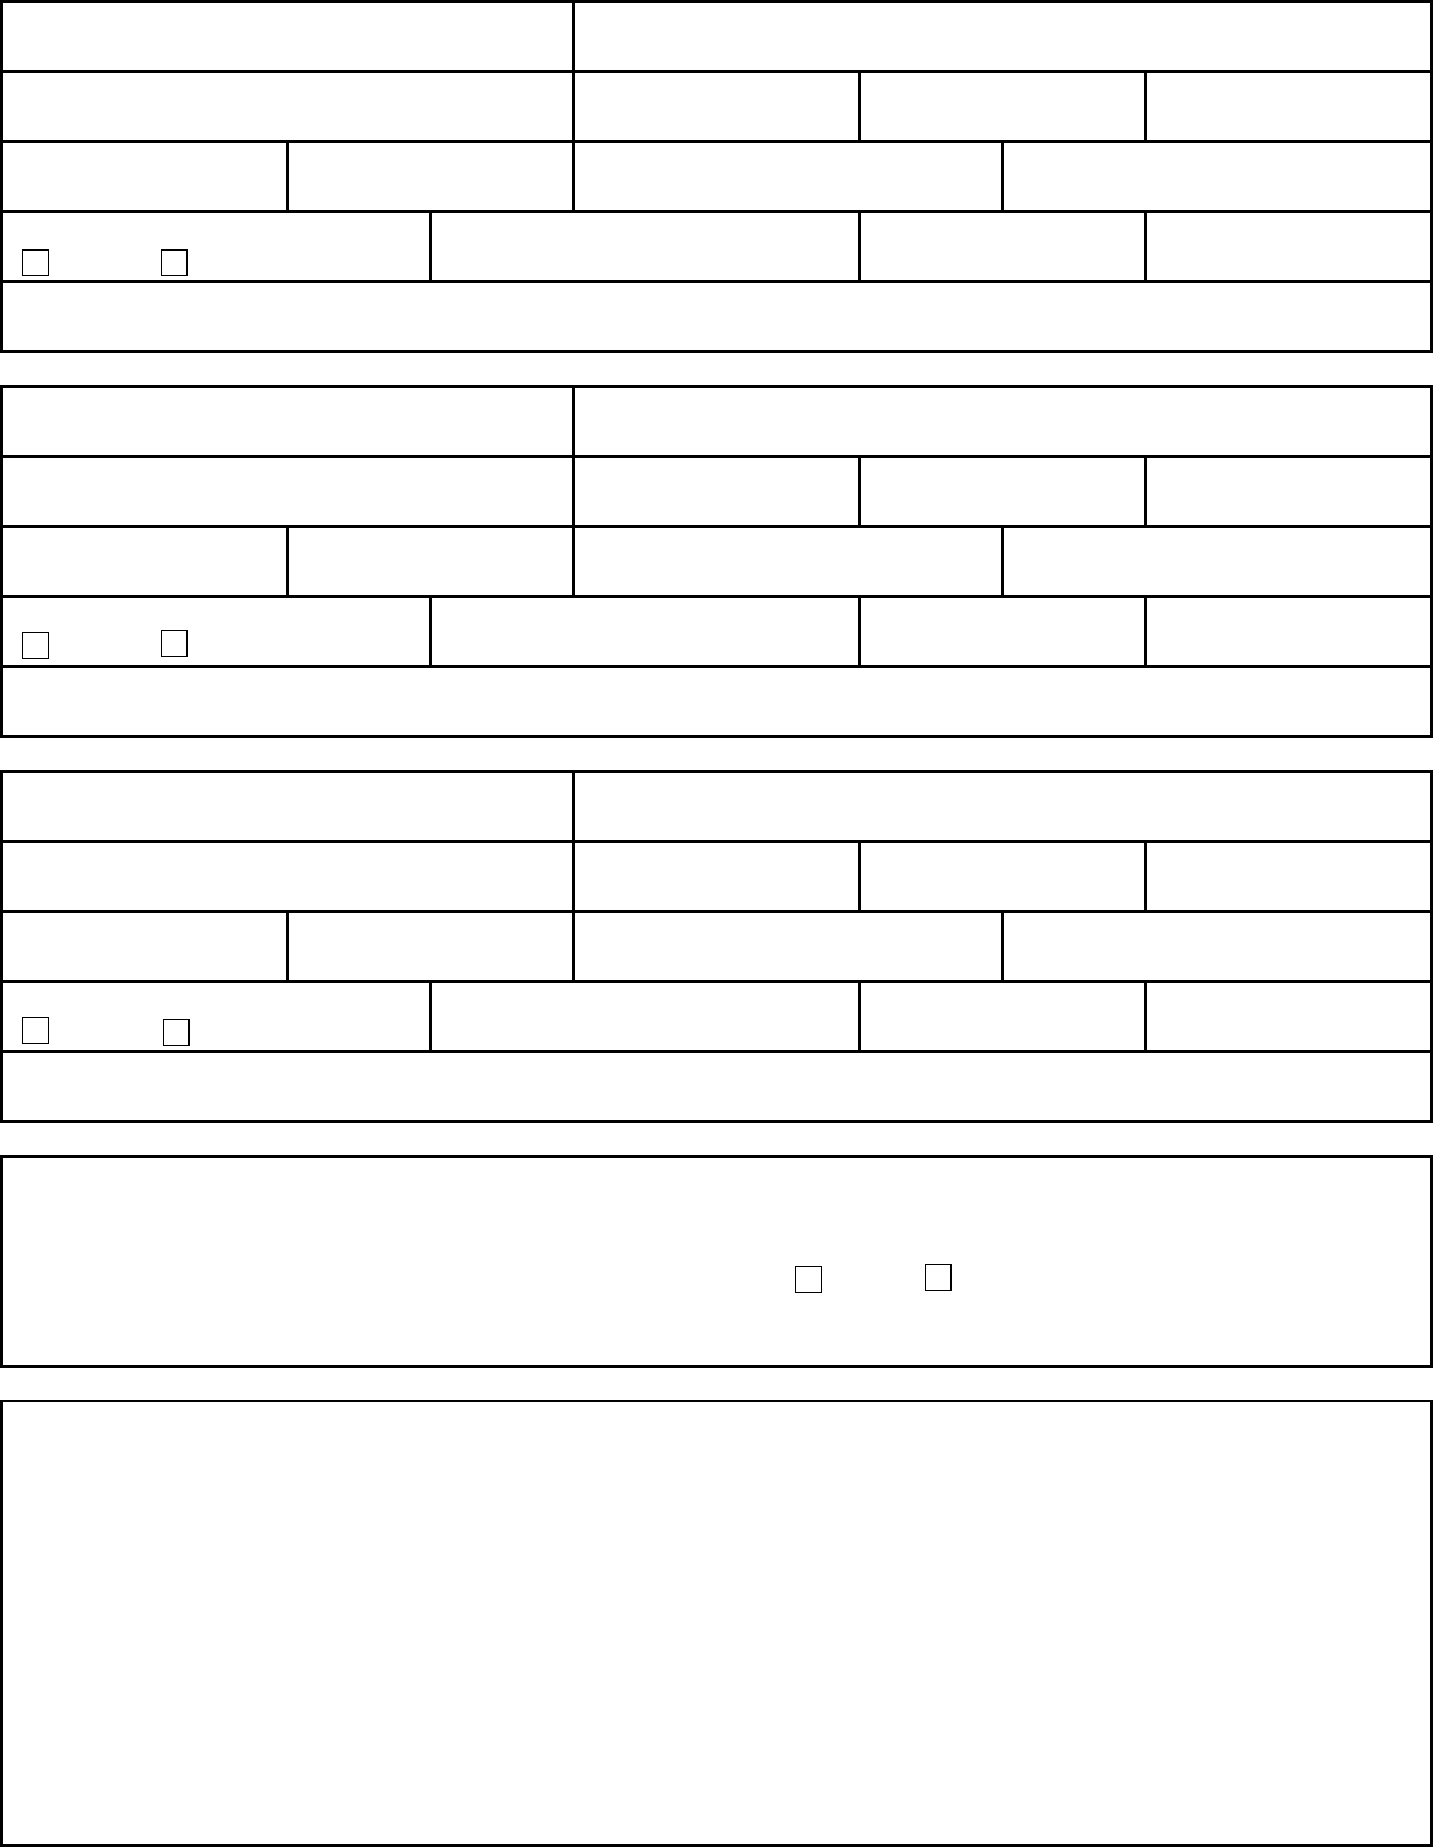 baskin robbins job application pdf